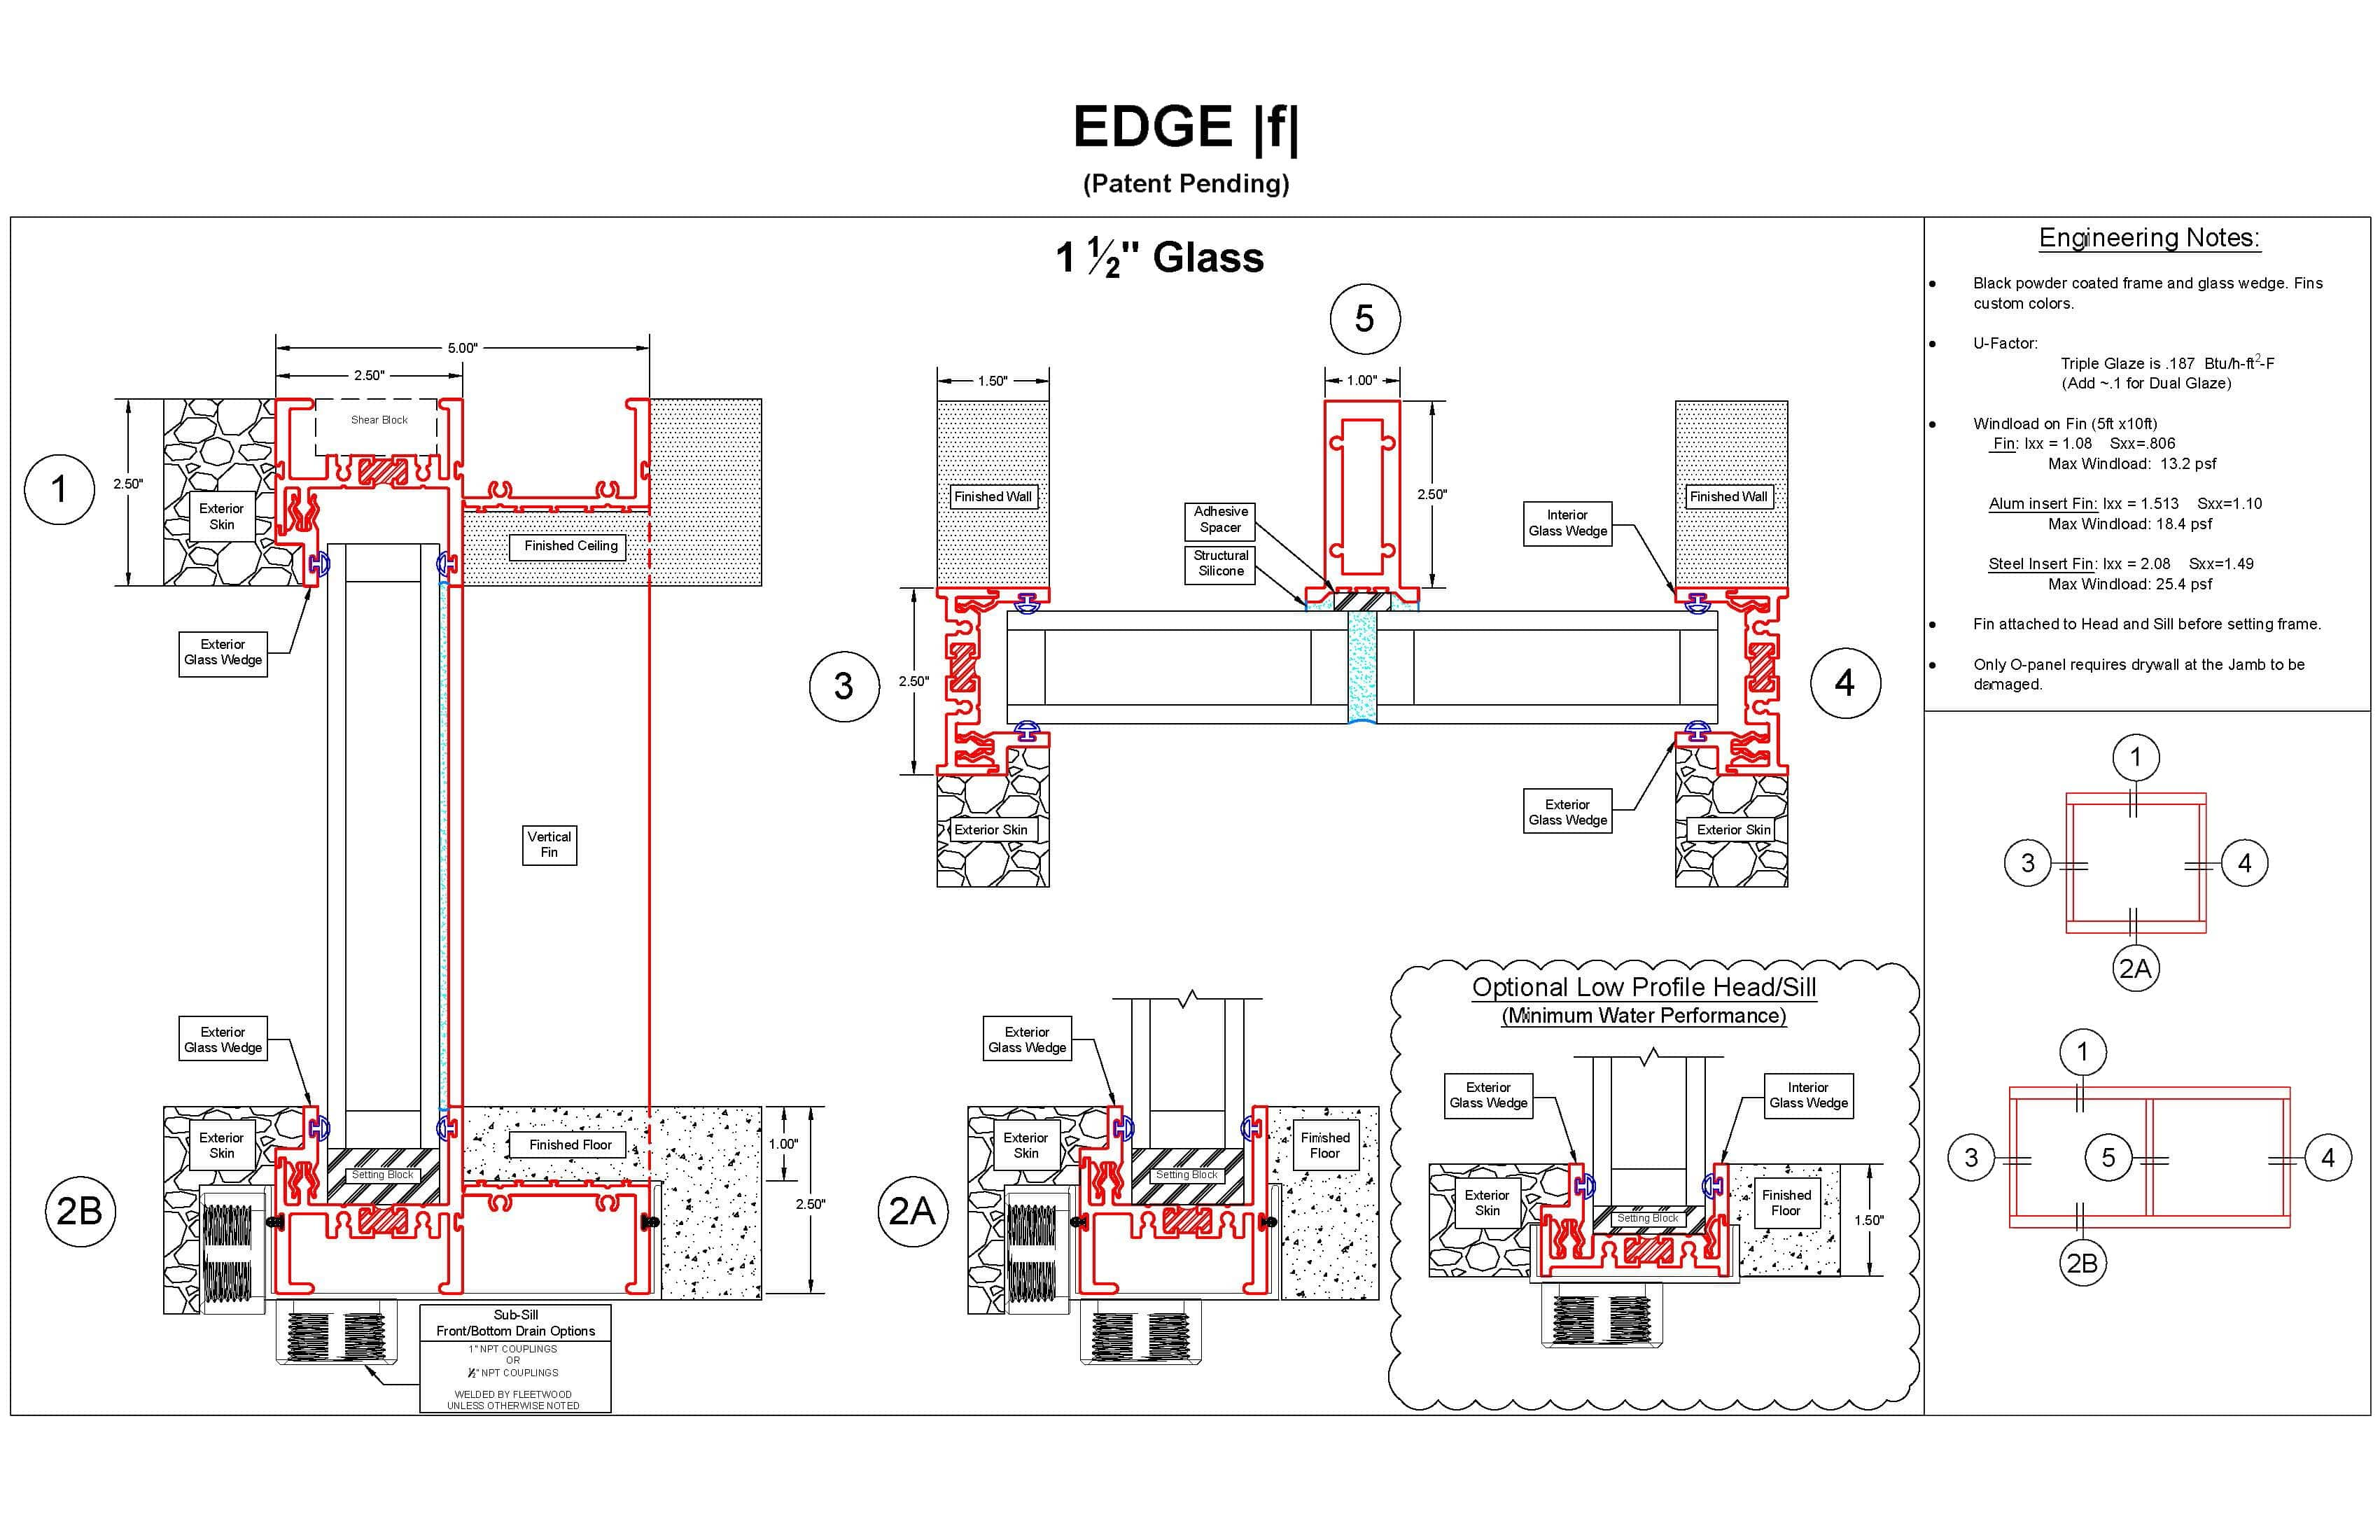 EDGE-f Architectural Details